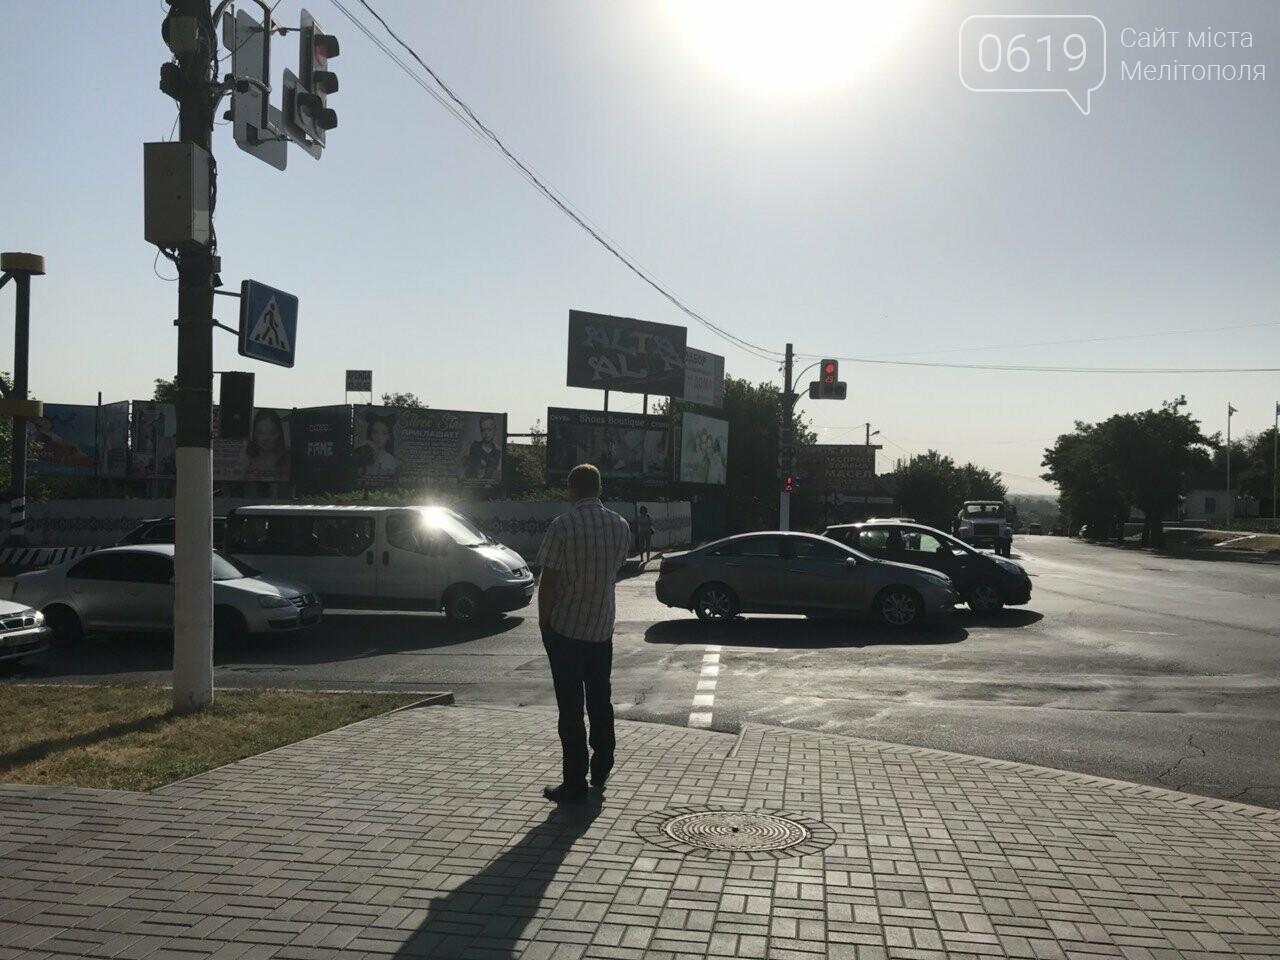 В Мелитополе на пешеходном переходе сбили девушку, - ФОТО, фото-2, Фото сайта 0619